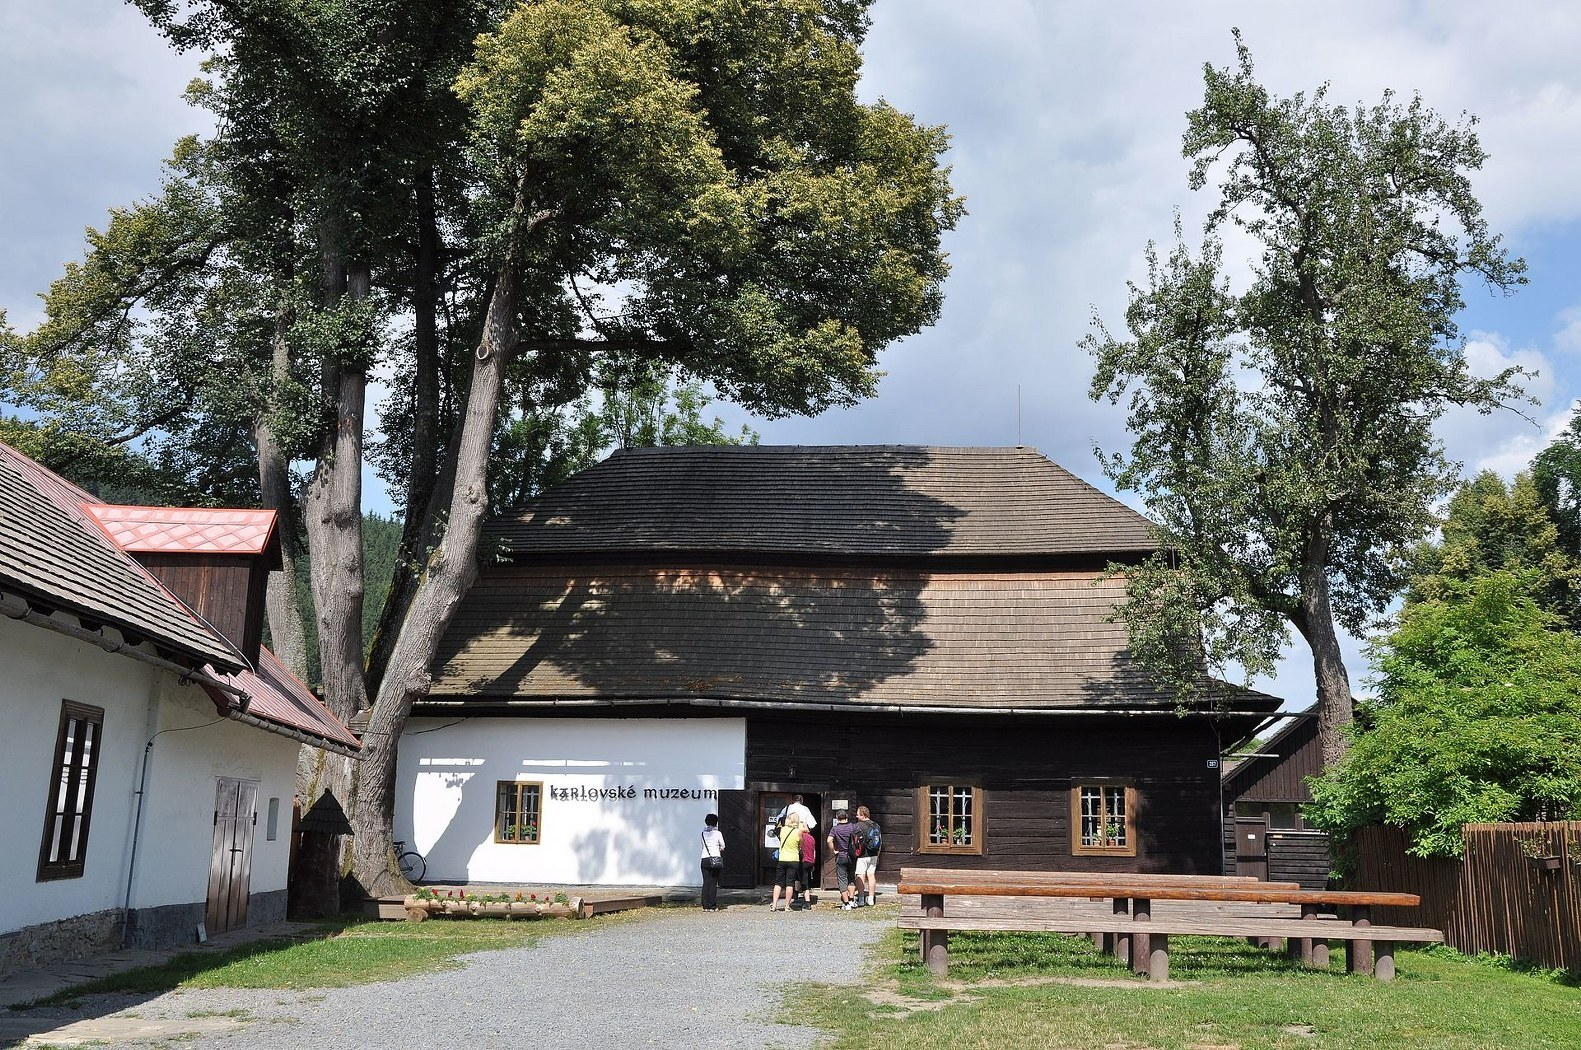 Карловский музей, (c) wikipedia.org - Ben Skála, Benfoto